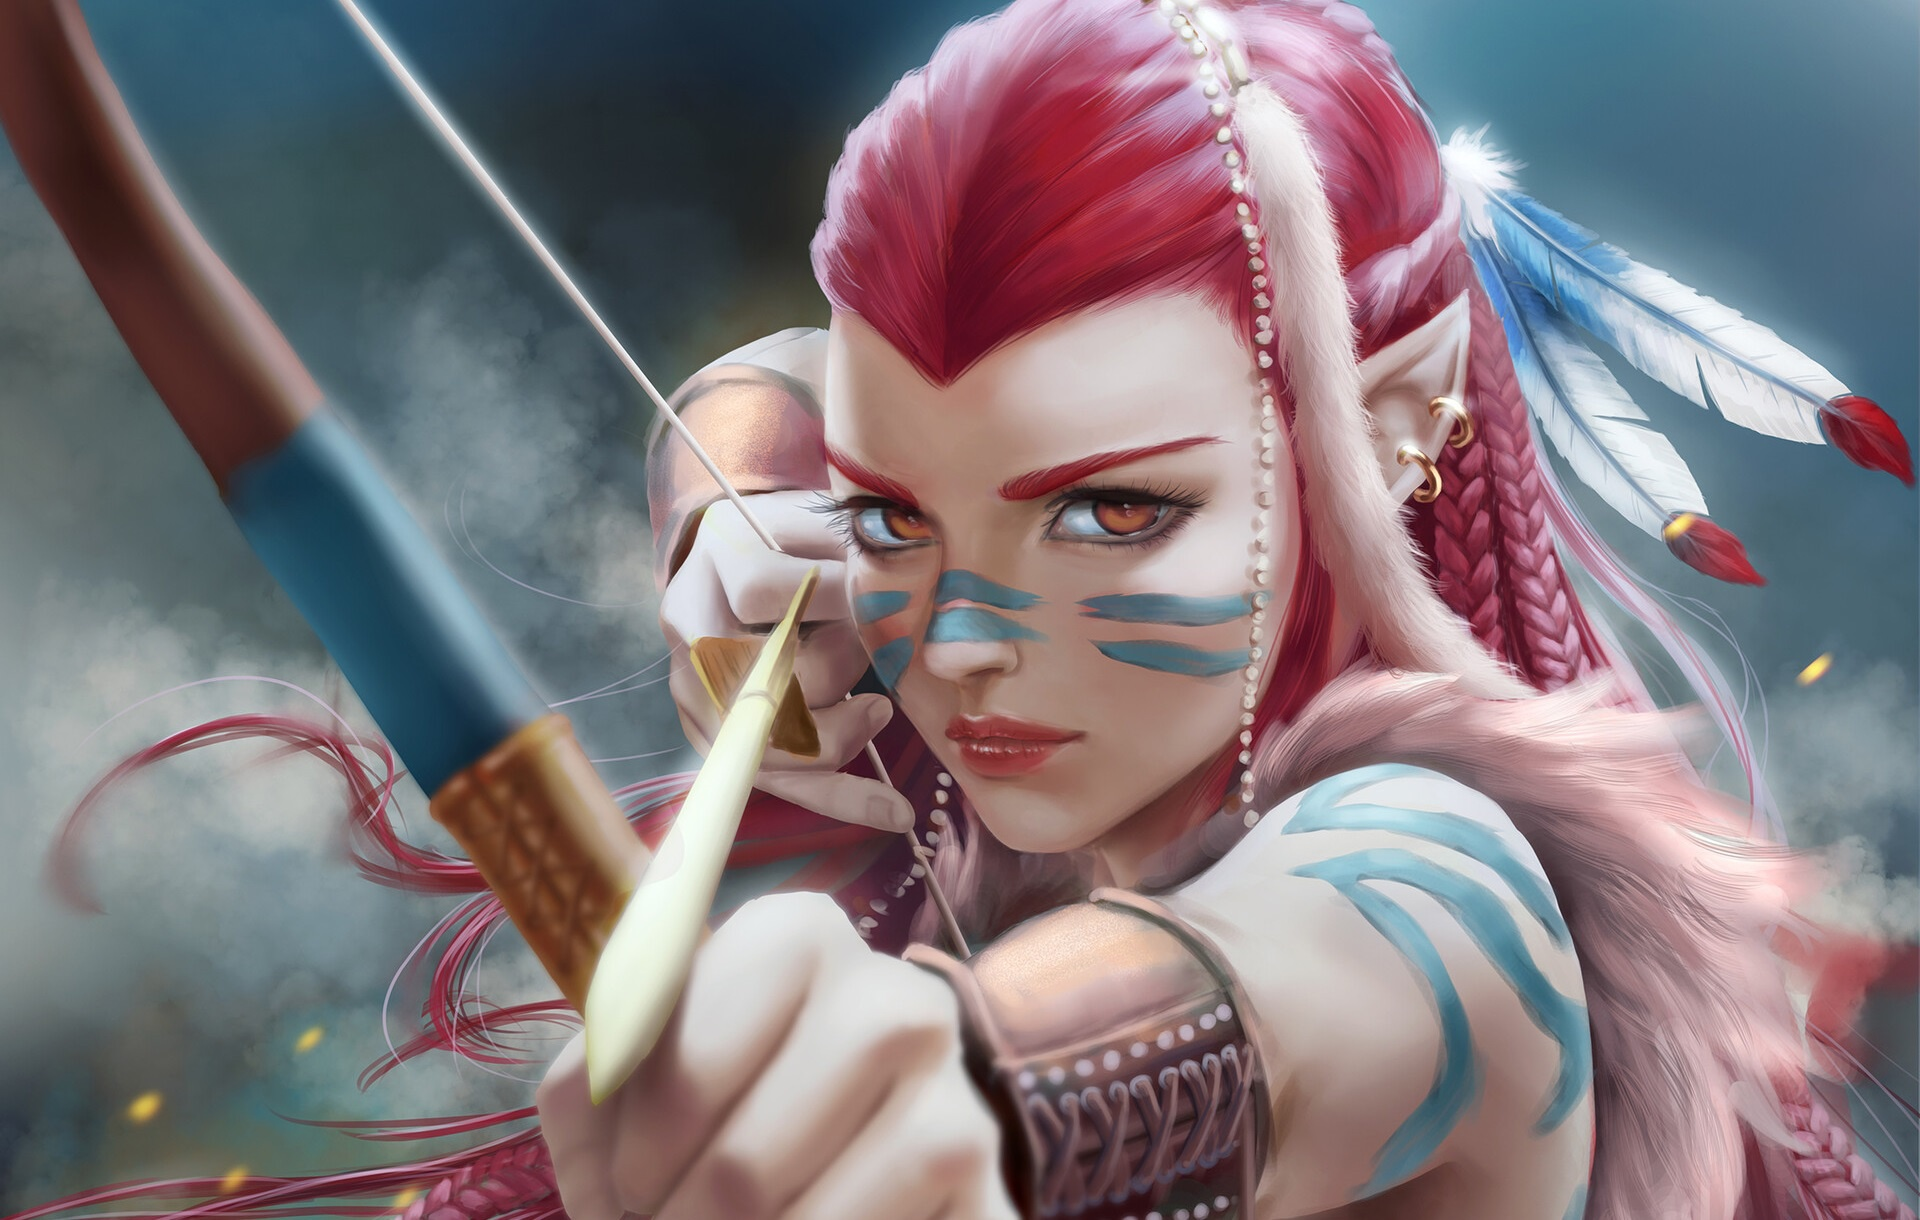 General 1920x1220 artwork archer bow fantasy art fantasy girl